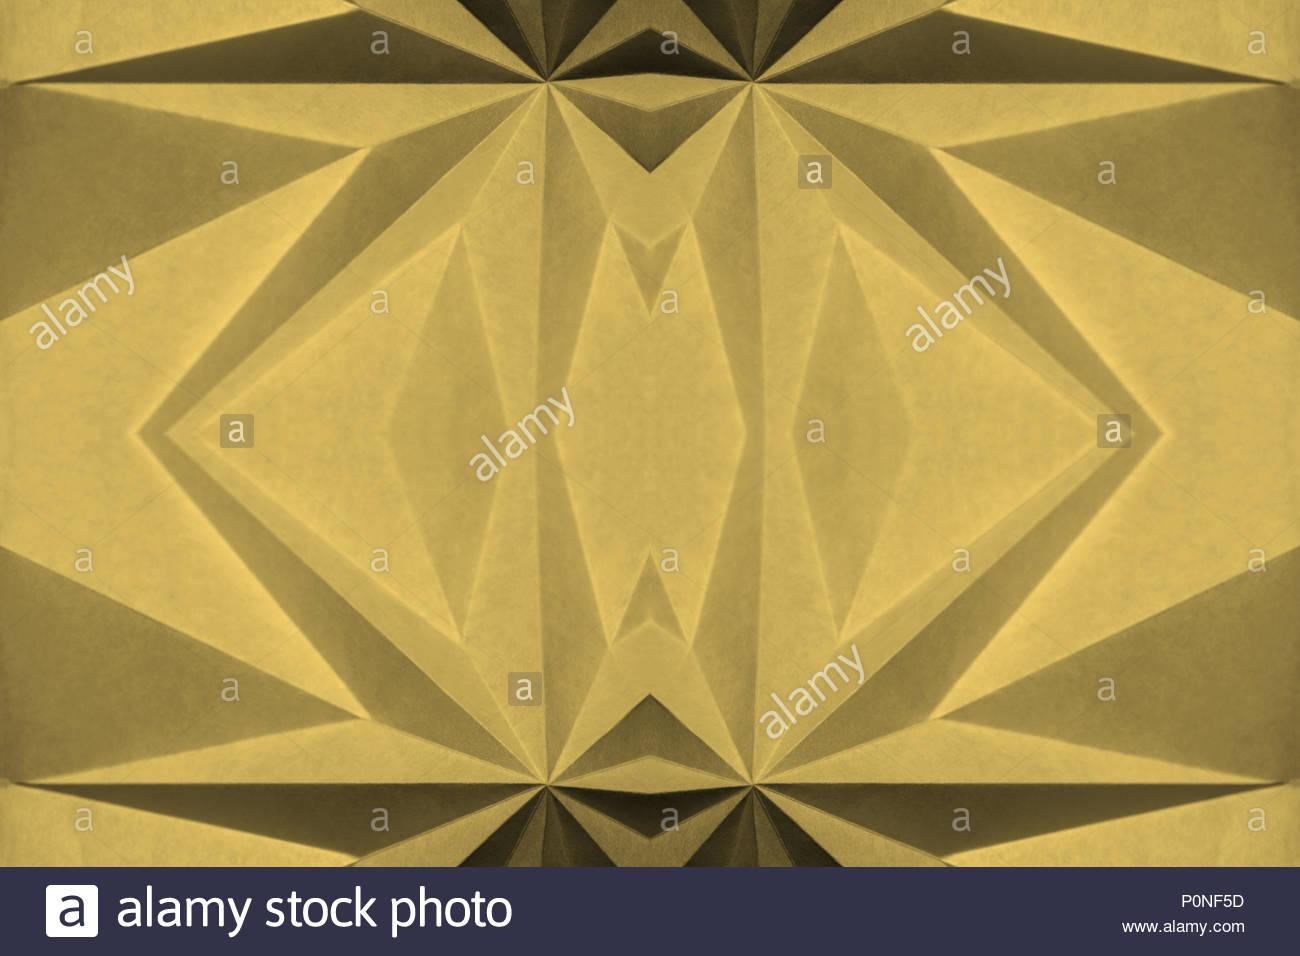 yellow abstract wallpaper background Origami, Bamboo; Pantone 14-0740. Angular monochrome graphic design element. - Stock Image